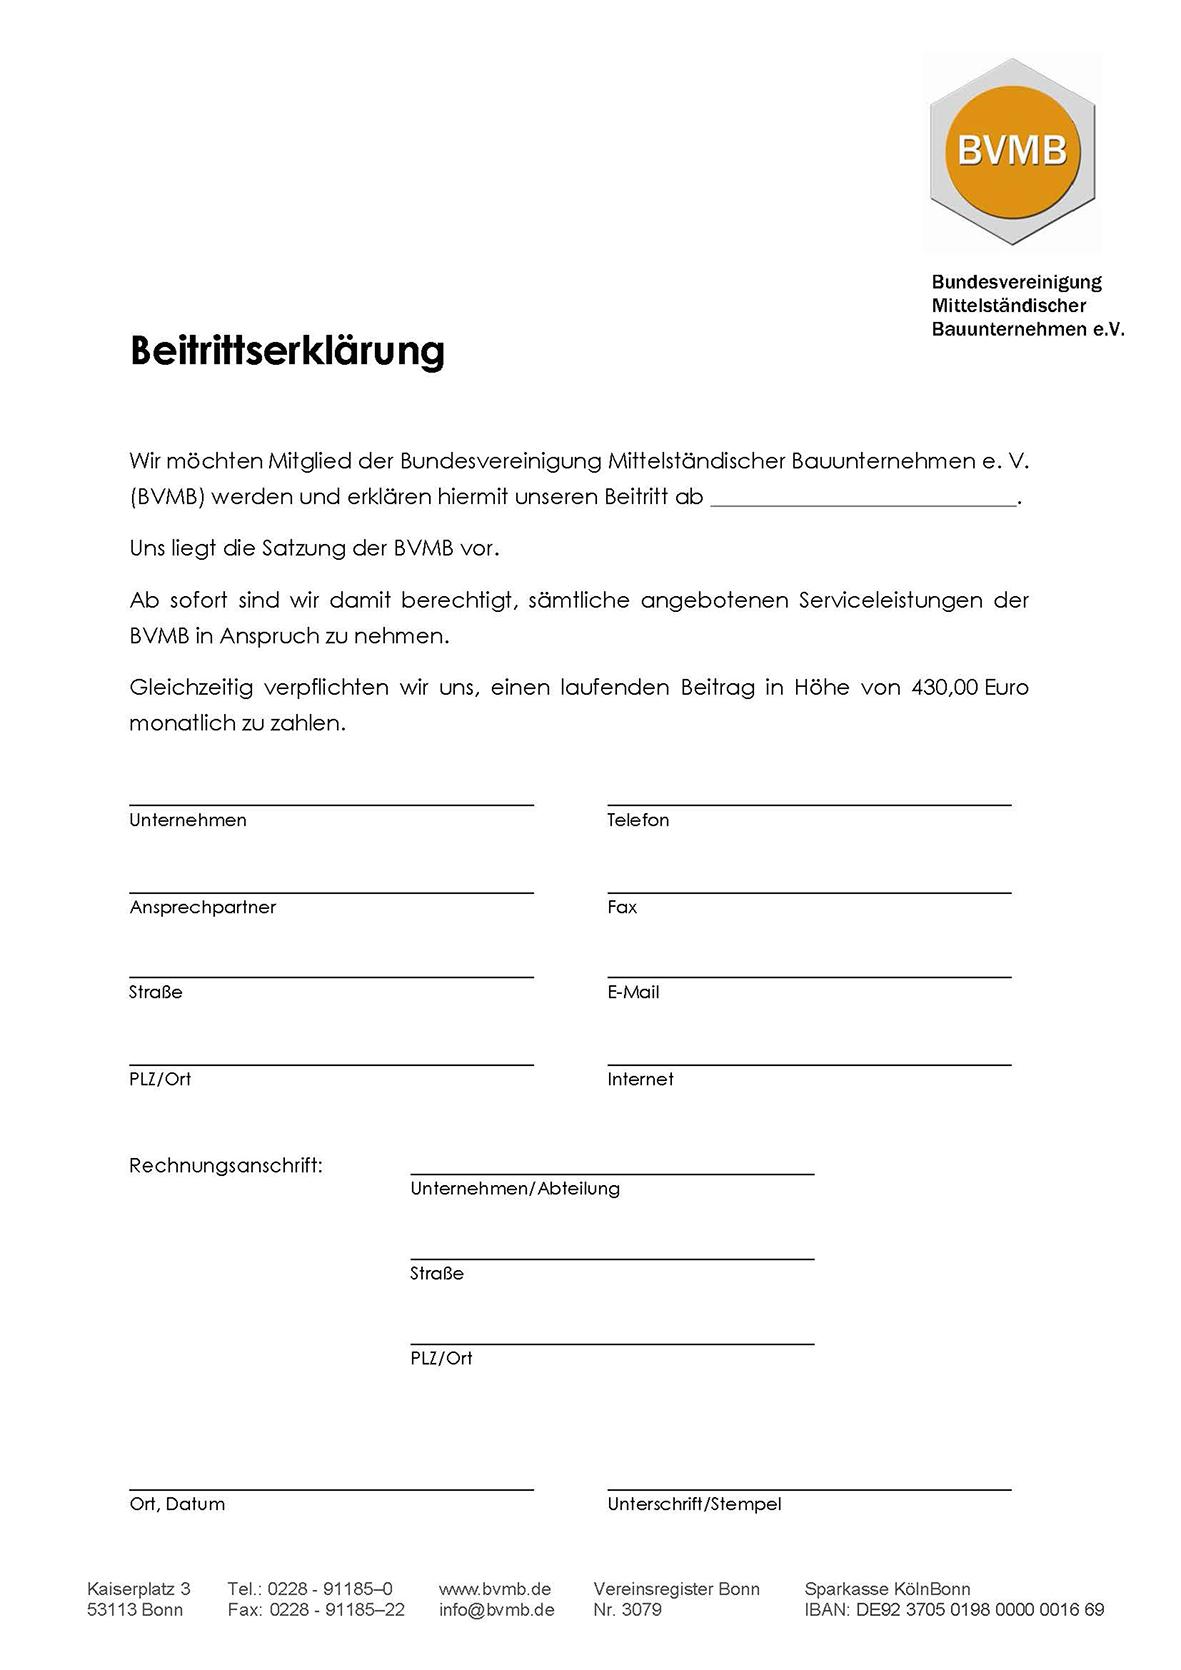 Bauunternehmen Bonn bvmb satzung beitritt